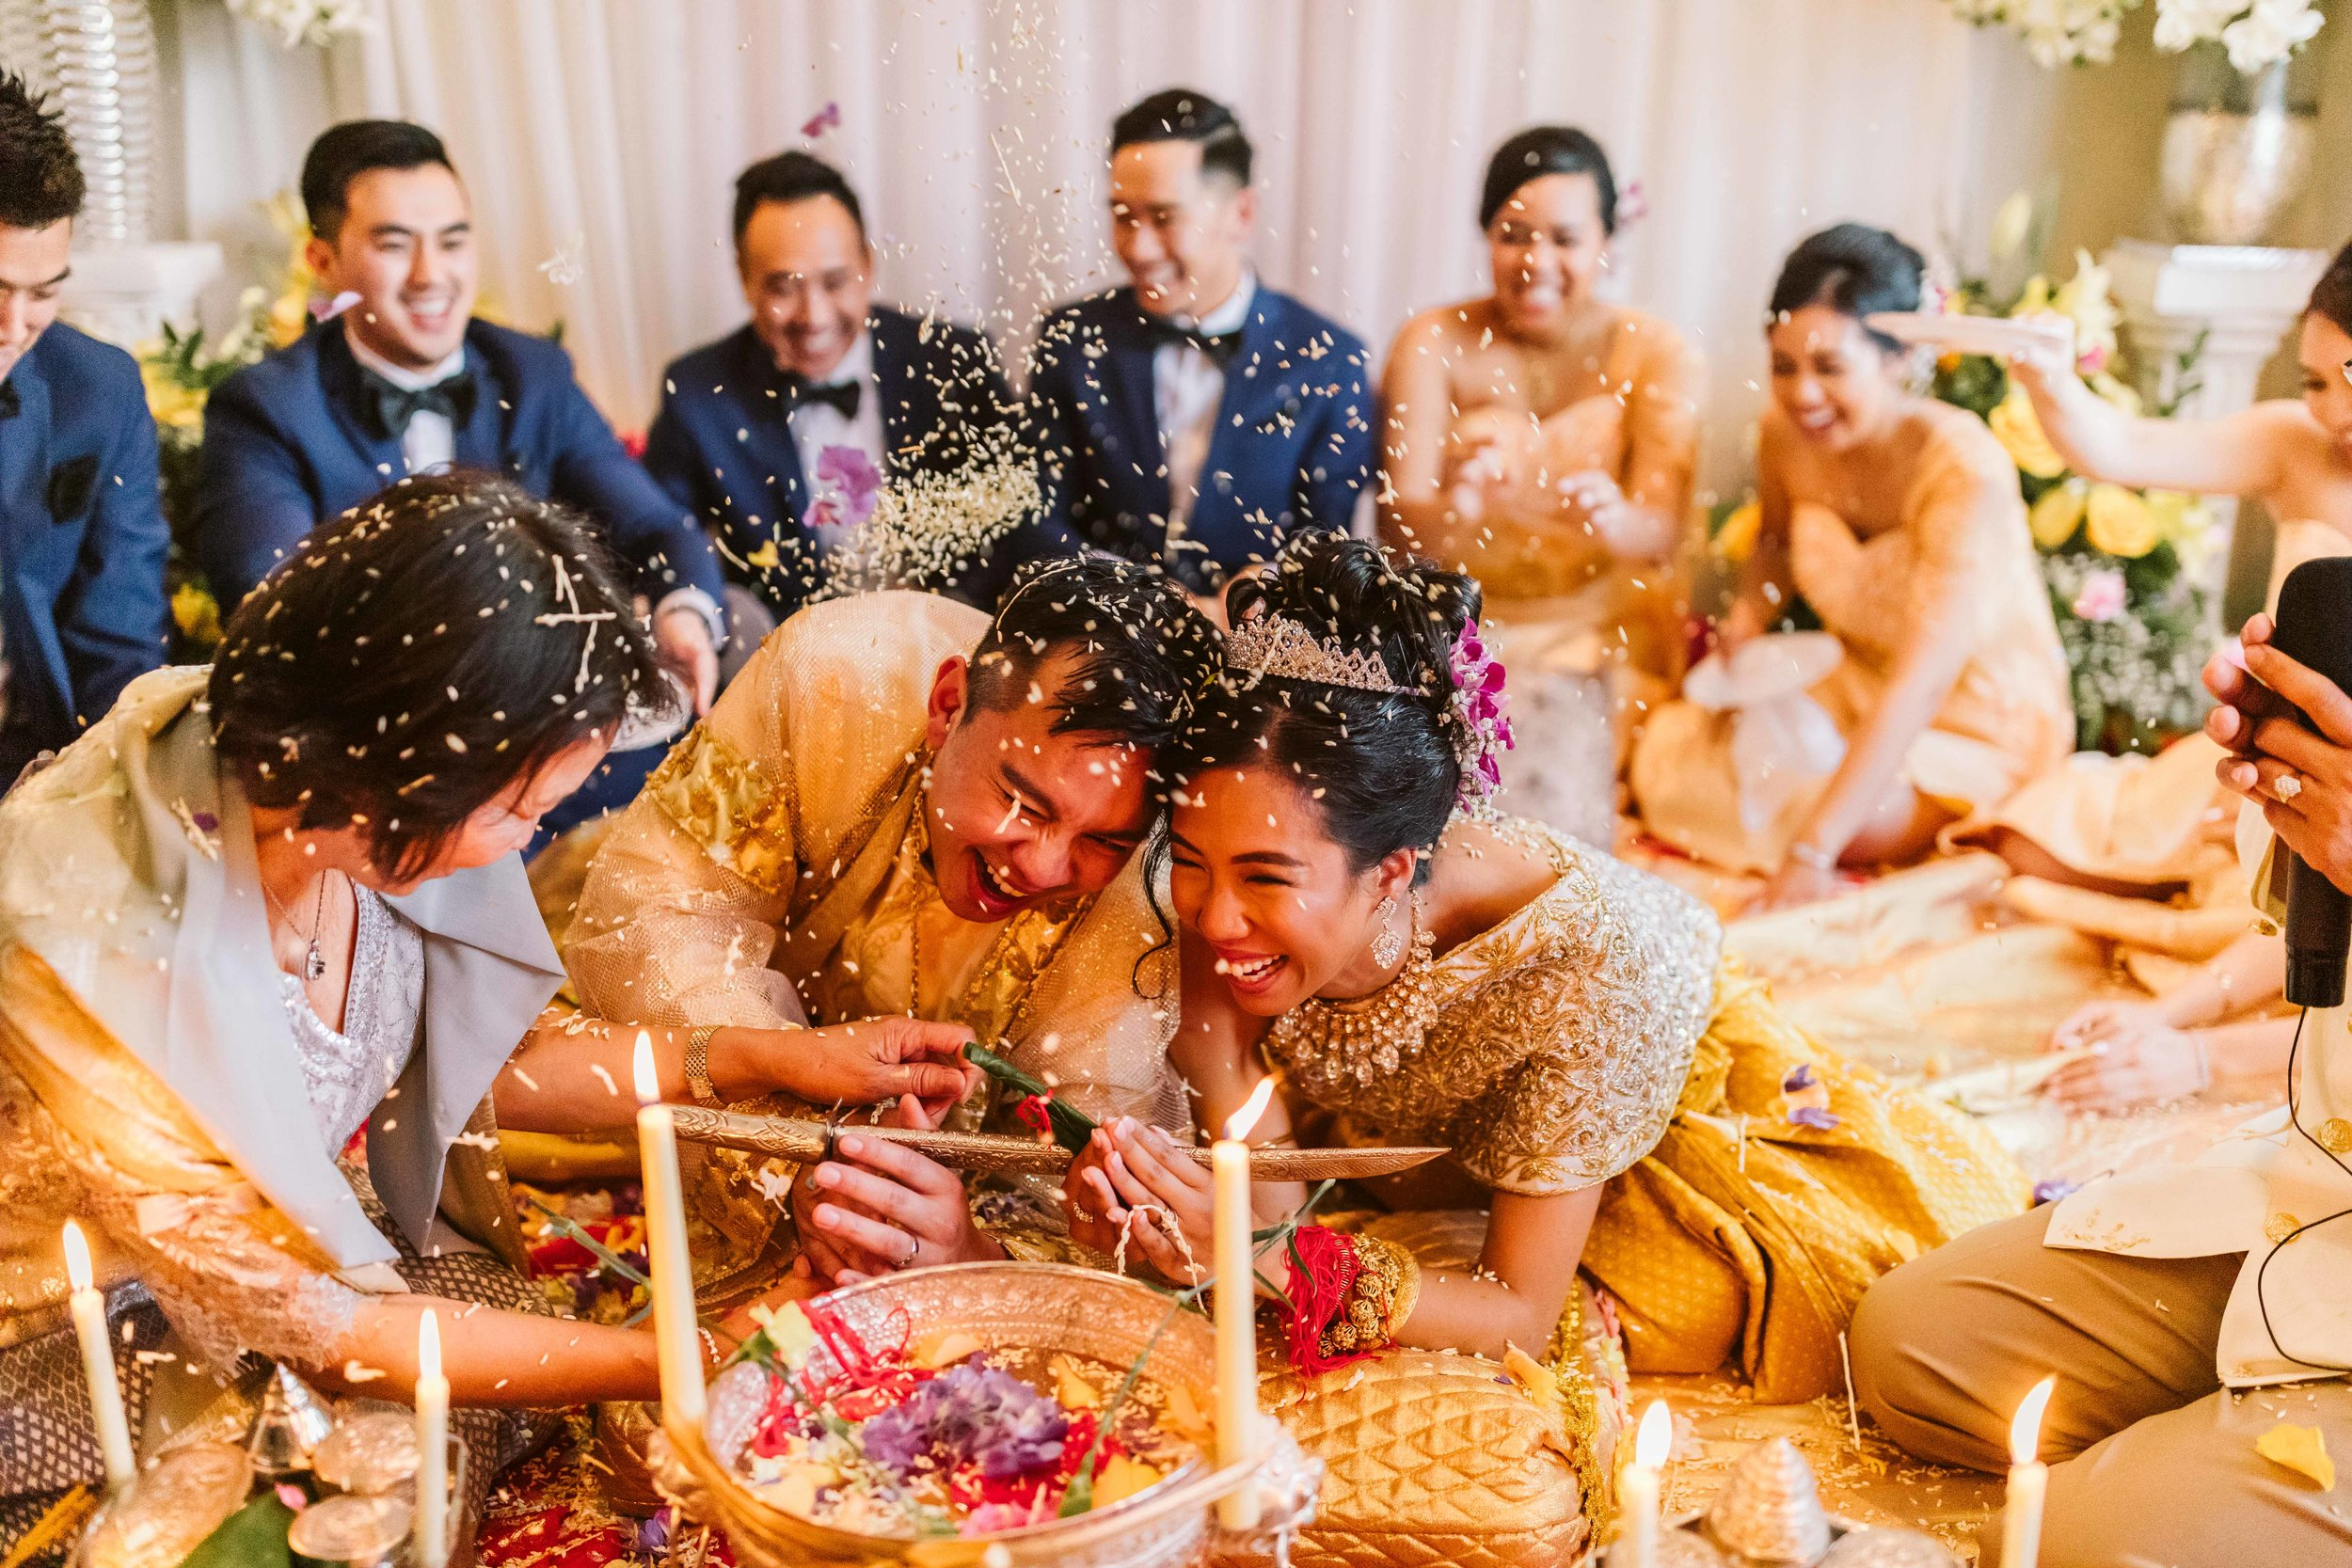 Oregon Bride Magazine - VIETNAMESE AND CAMBODIAN 2-DAY WEDDING WEEKENDKhoa + Stephany